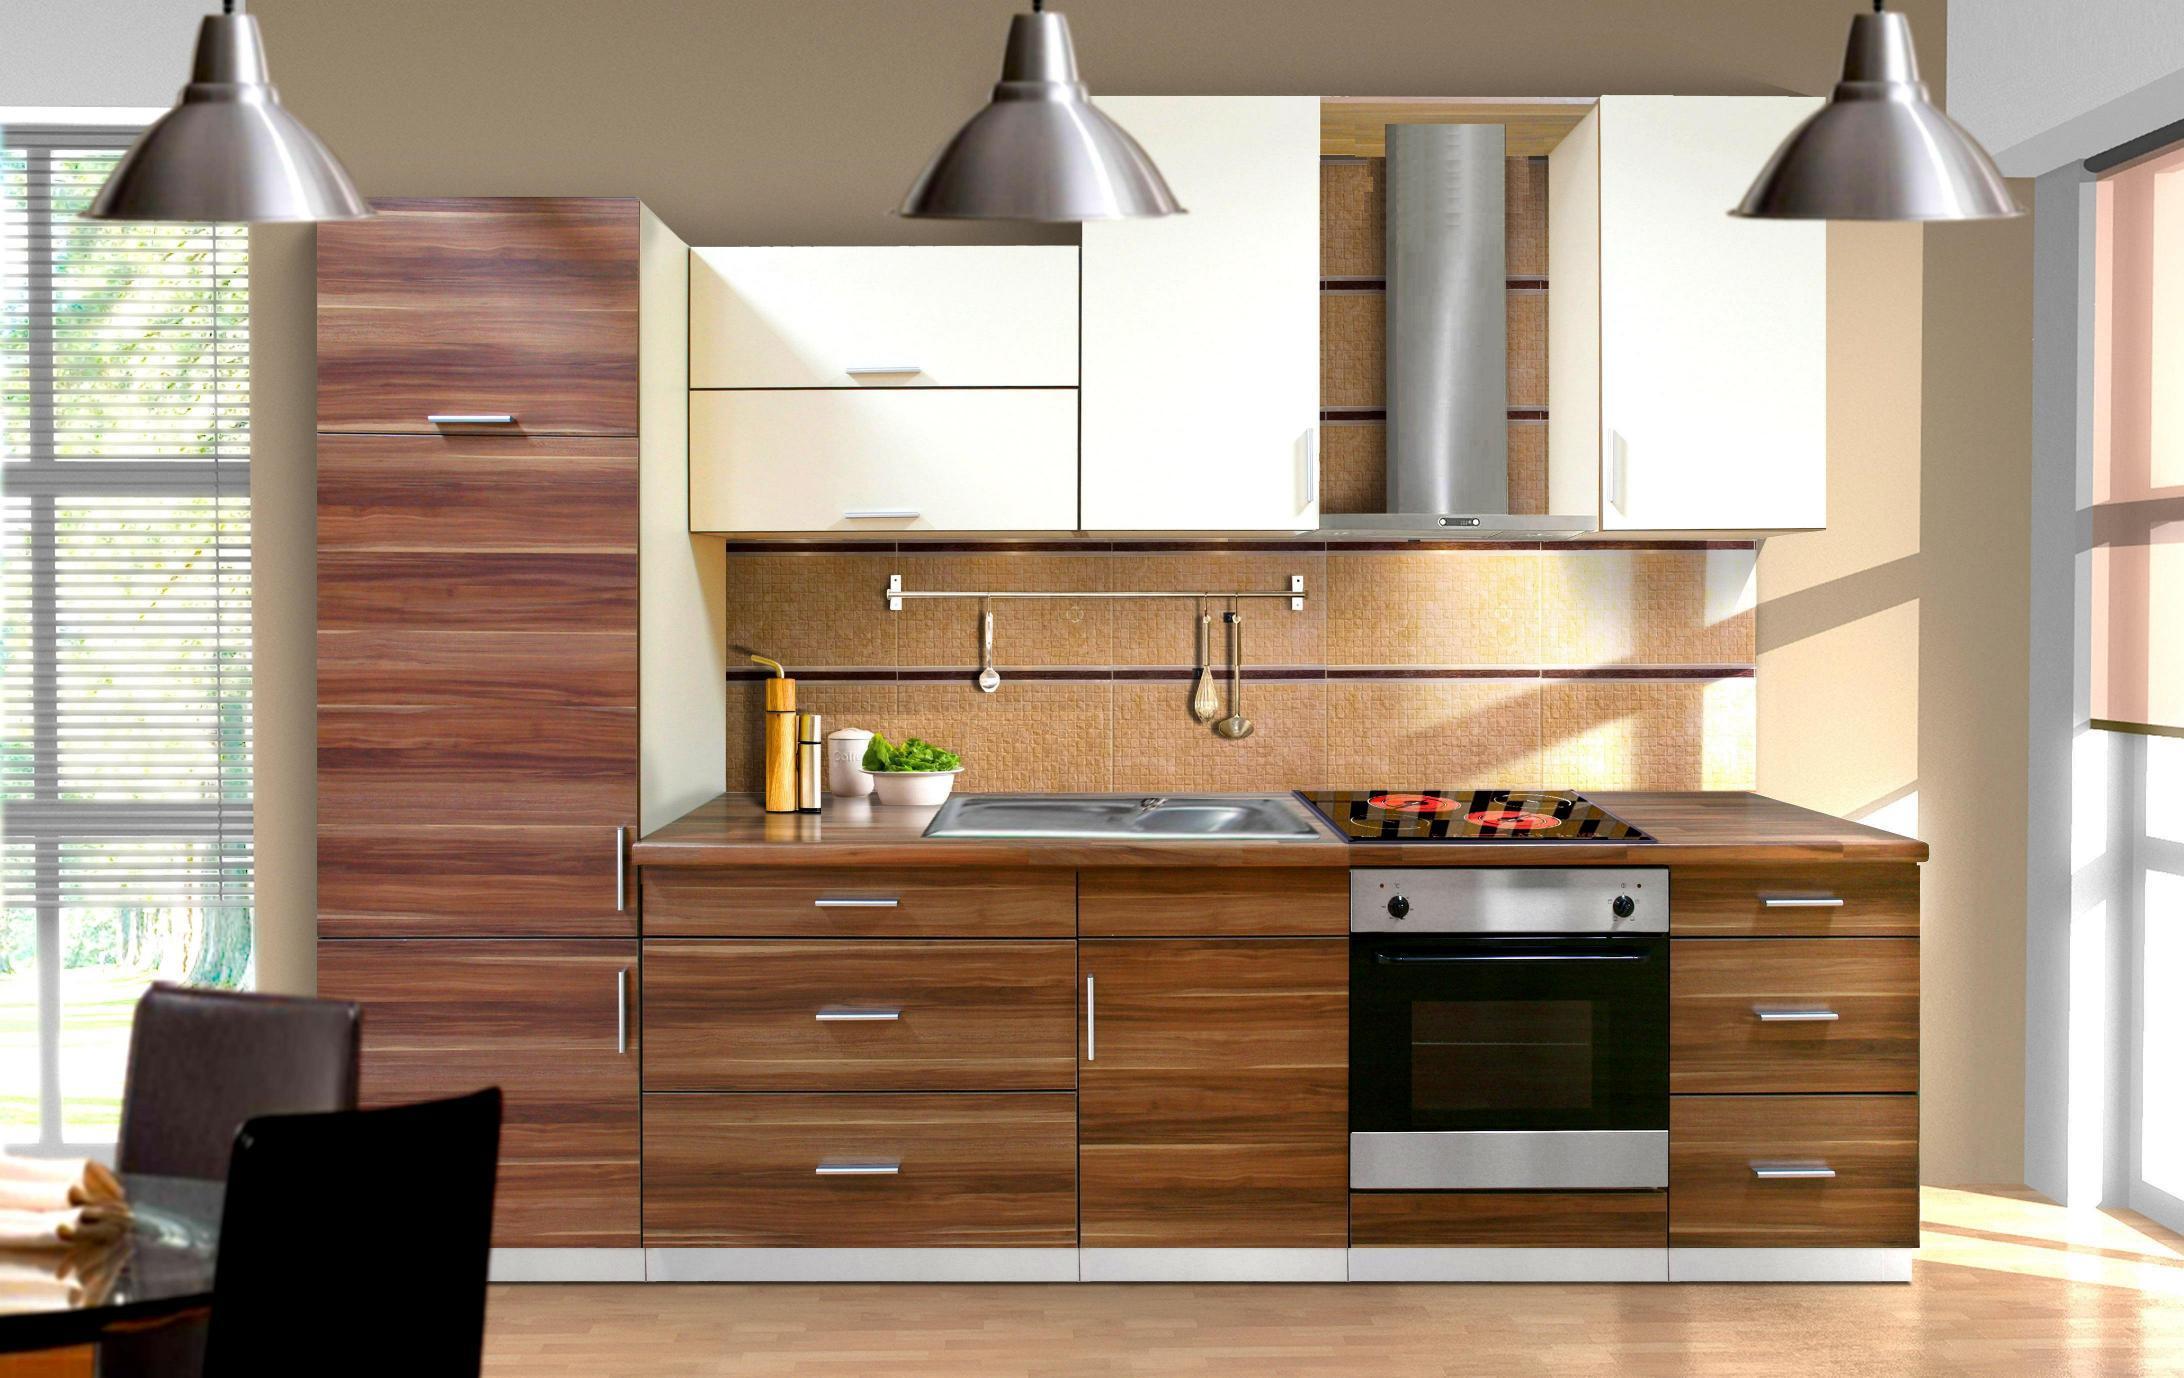 modern kitchen cabinet design ideas furnished electric oven range kitchen cabinets kitchen cabinets design furniture